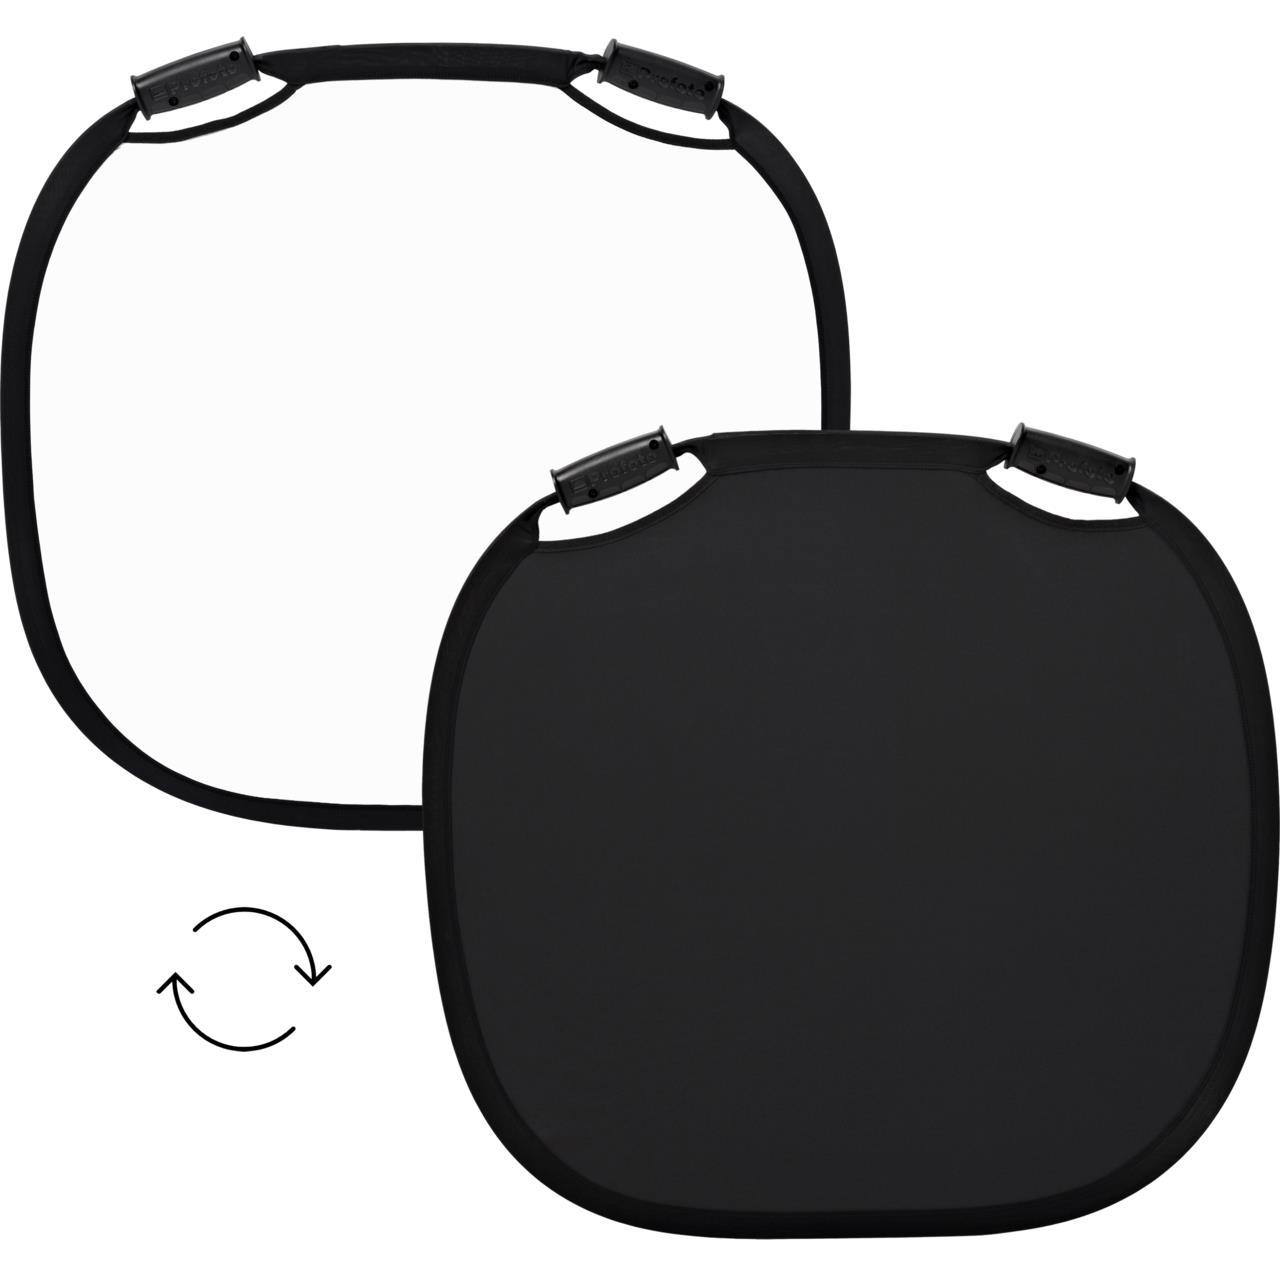 Profoto Collapsible Reflector White/Black L - 8€ Day/Unit